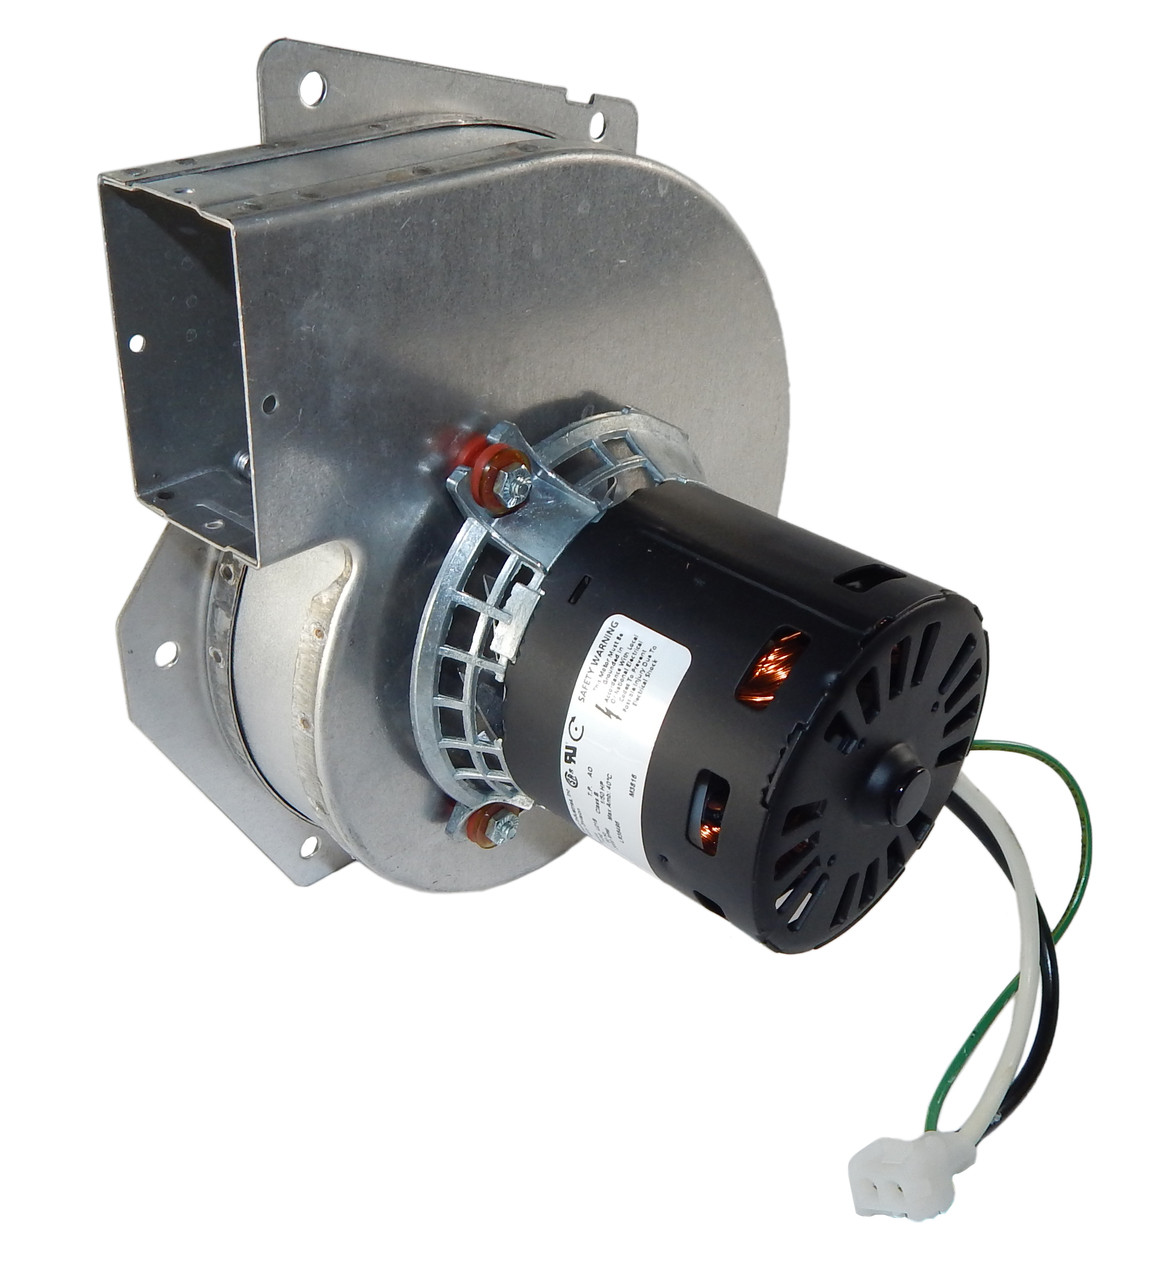 small resolution of trane furnace draft inducer blower jakel j238 138 1344 115v fasco a143